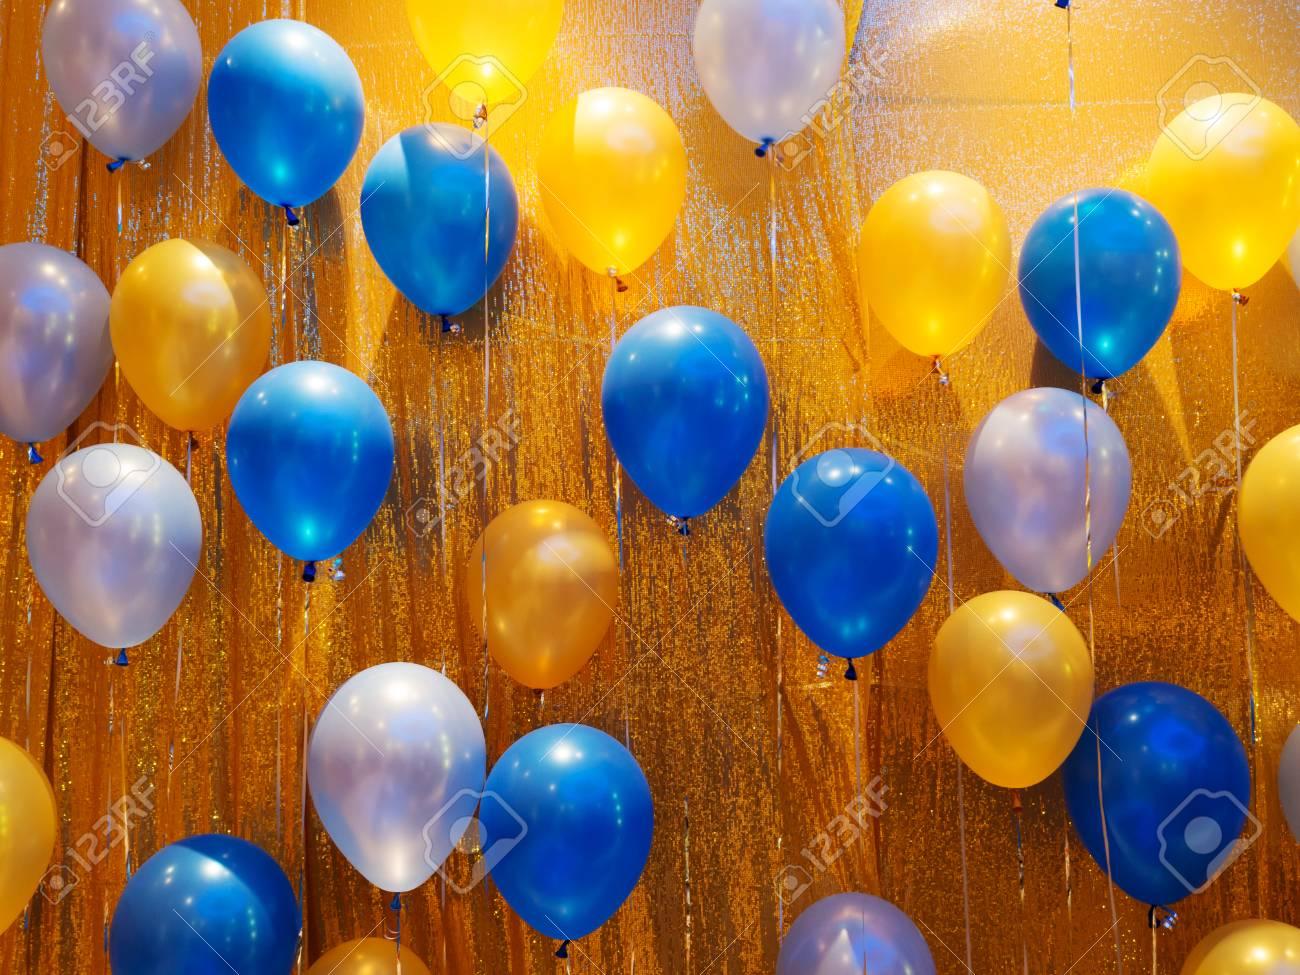 Blue Orange Yellow And White Balloons Decoration On Golden Stock